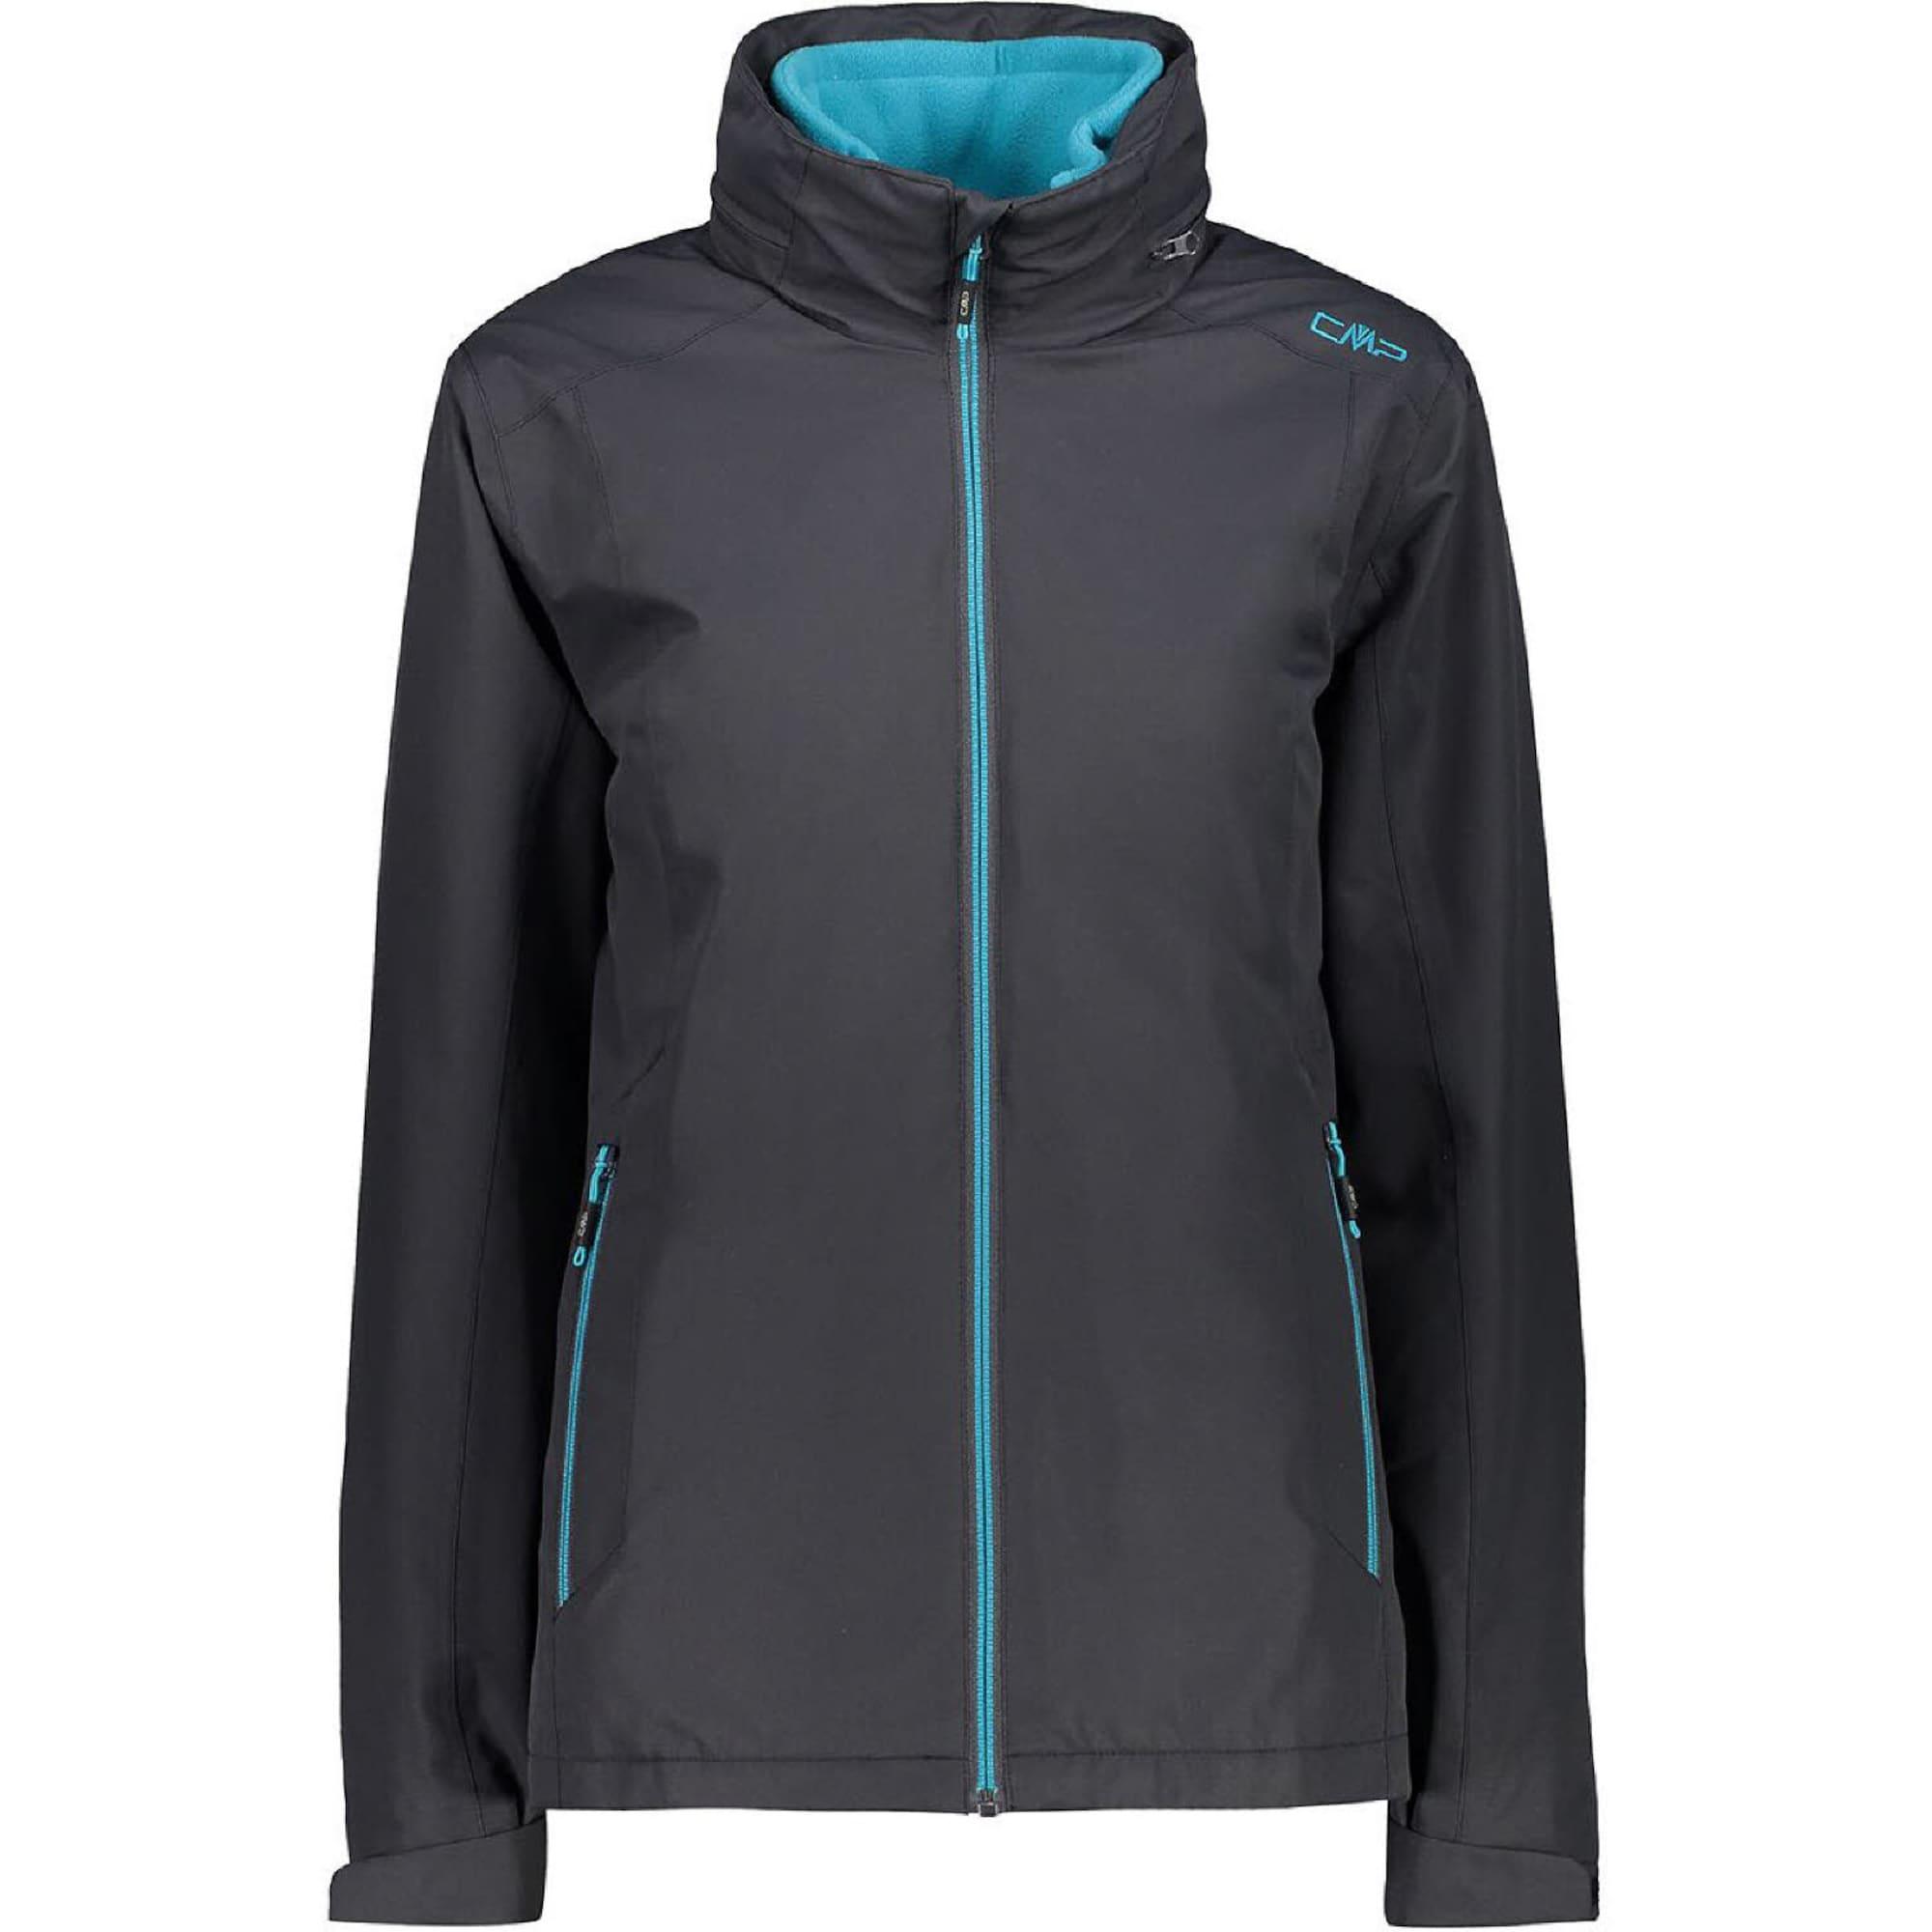 CMP Laisvalaikio striukė 'Doppel Arctic Fleece' turkio spalva / antracito